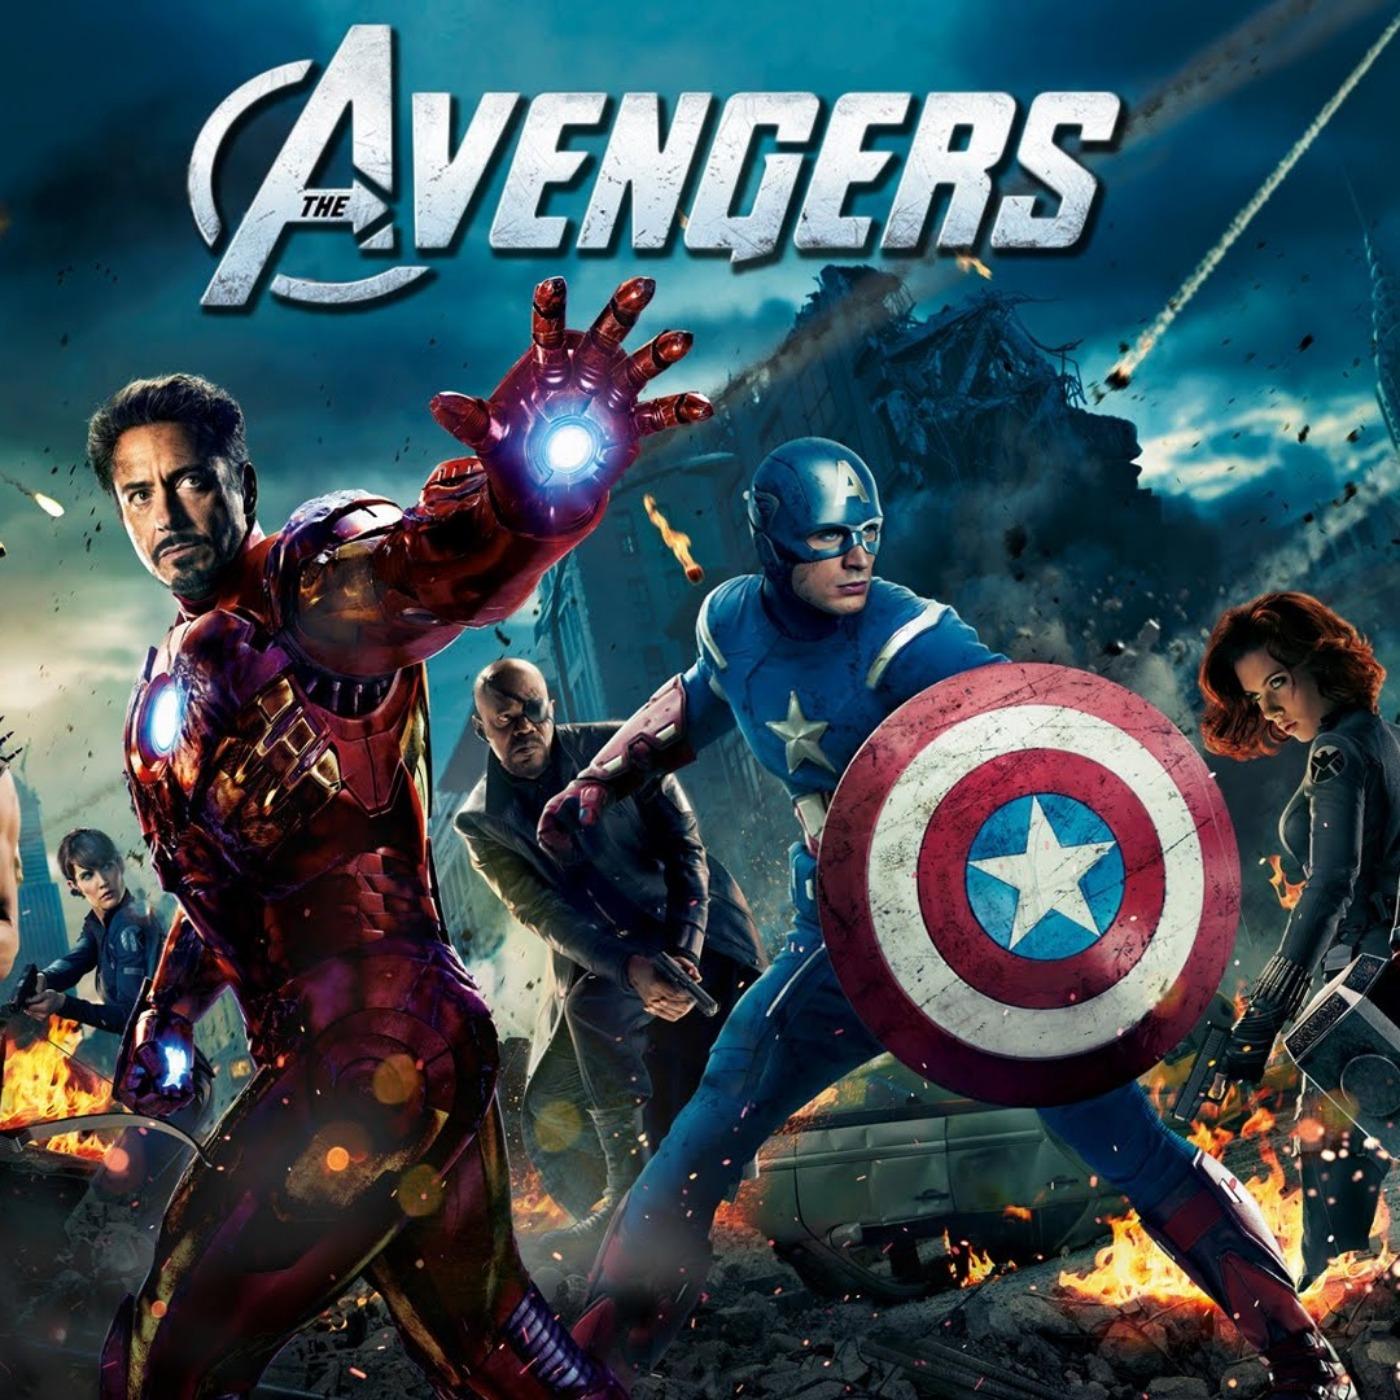 PODCAST CINEMA | critique du film Marvel AVENGERS 1 (2012) | CinéMaRadio